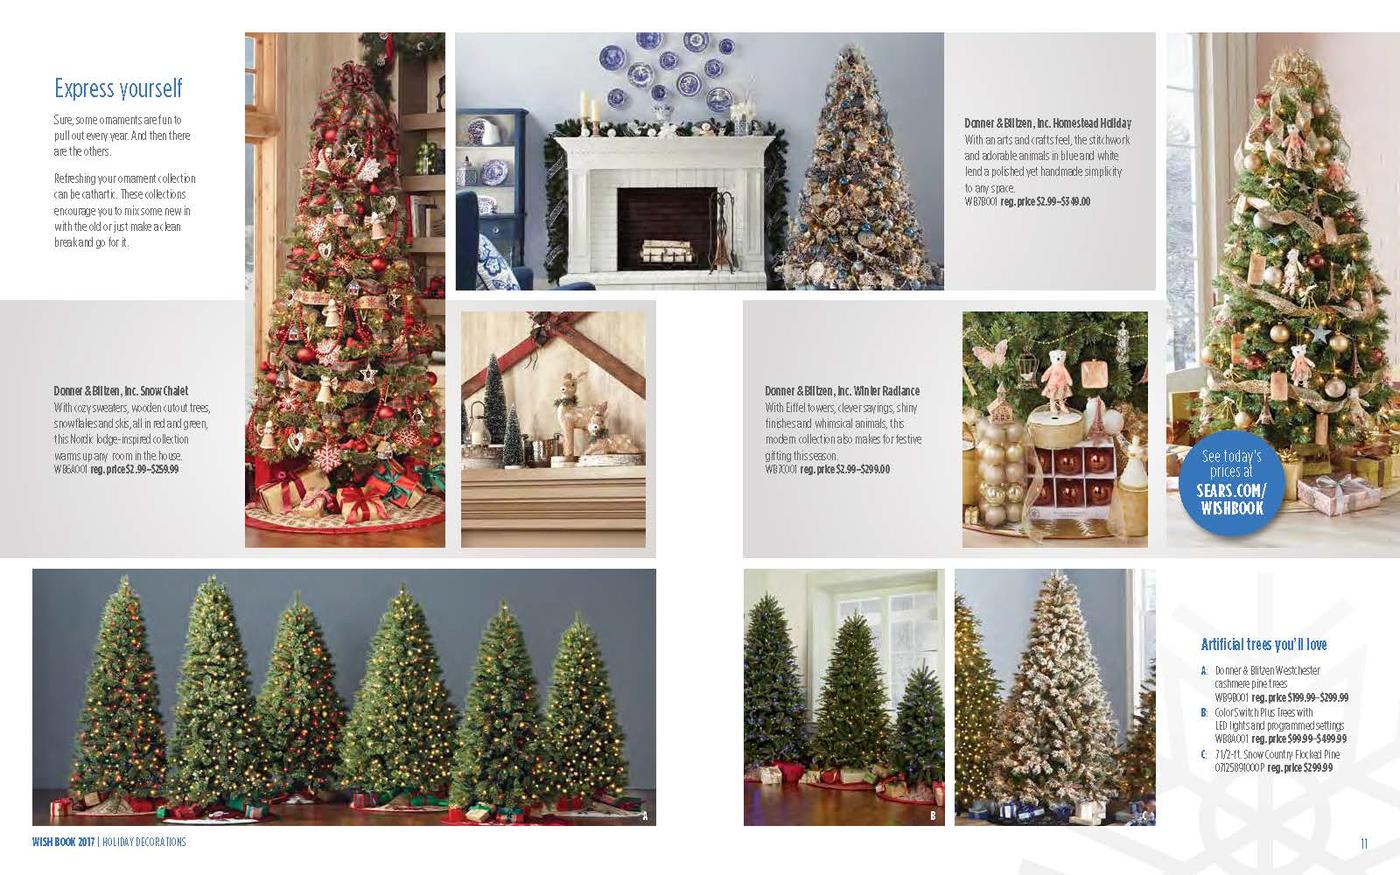 Sears 2017 Wishbook by Kelly Webb at Coroflot.com